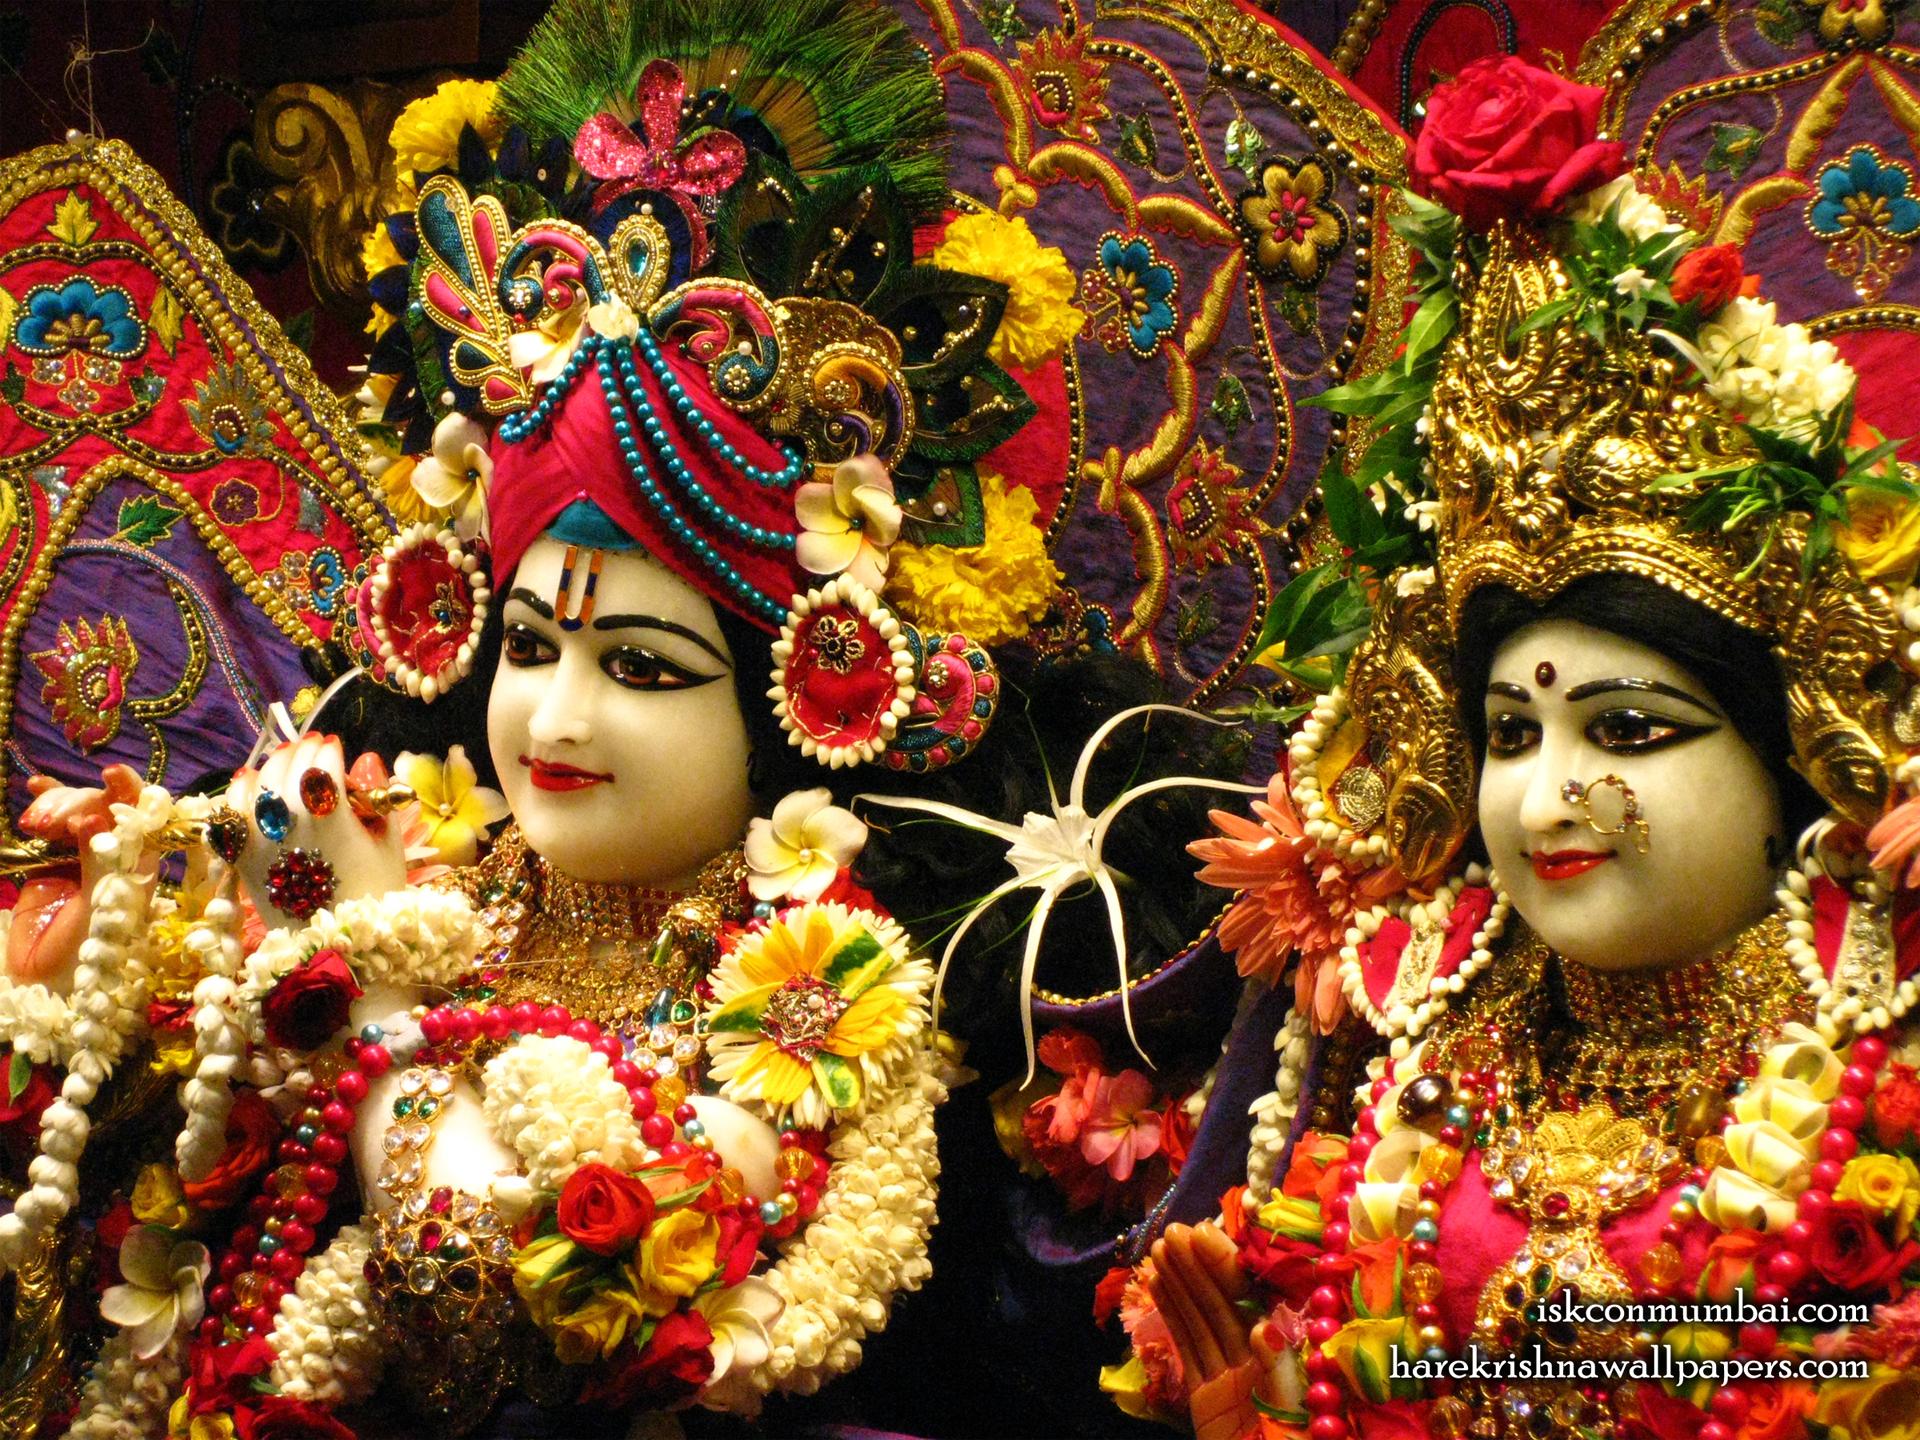 Sri Sri Radha Rasabihari Close up Wallpaper (013) Size 1920x1440 Download